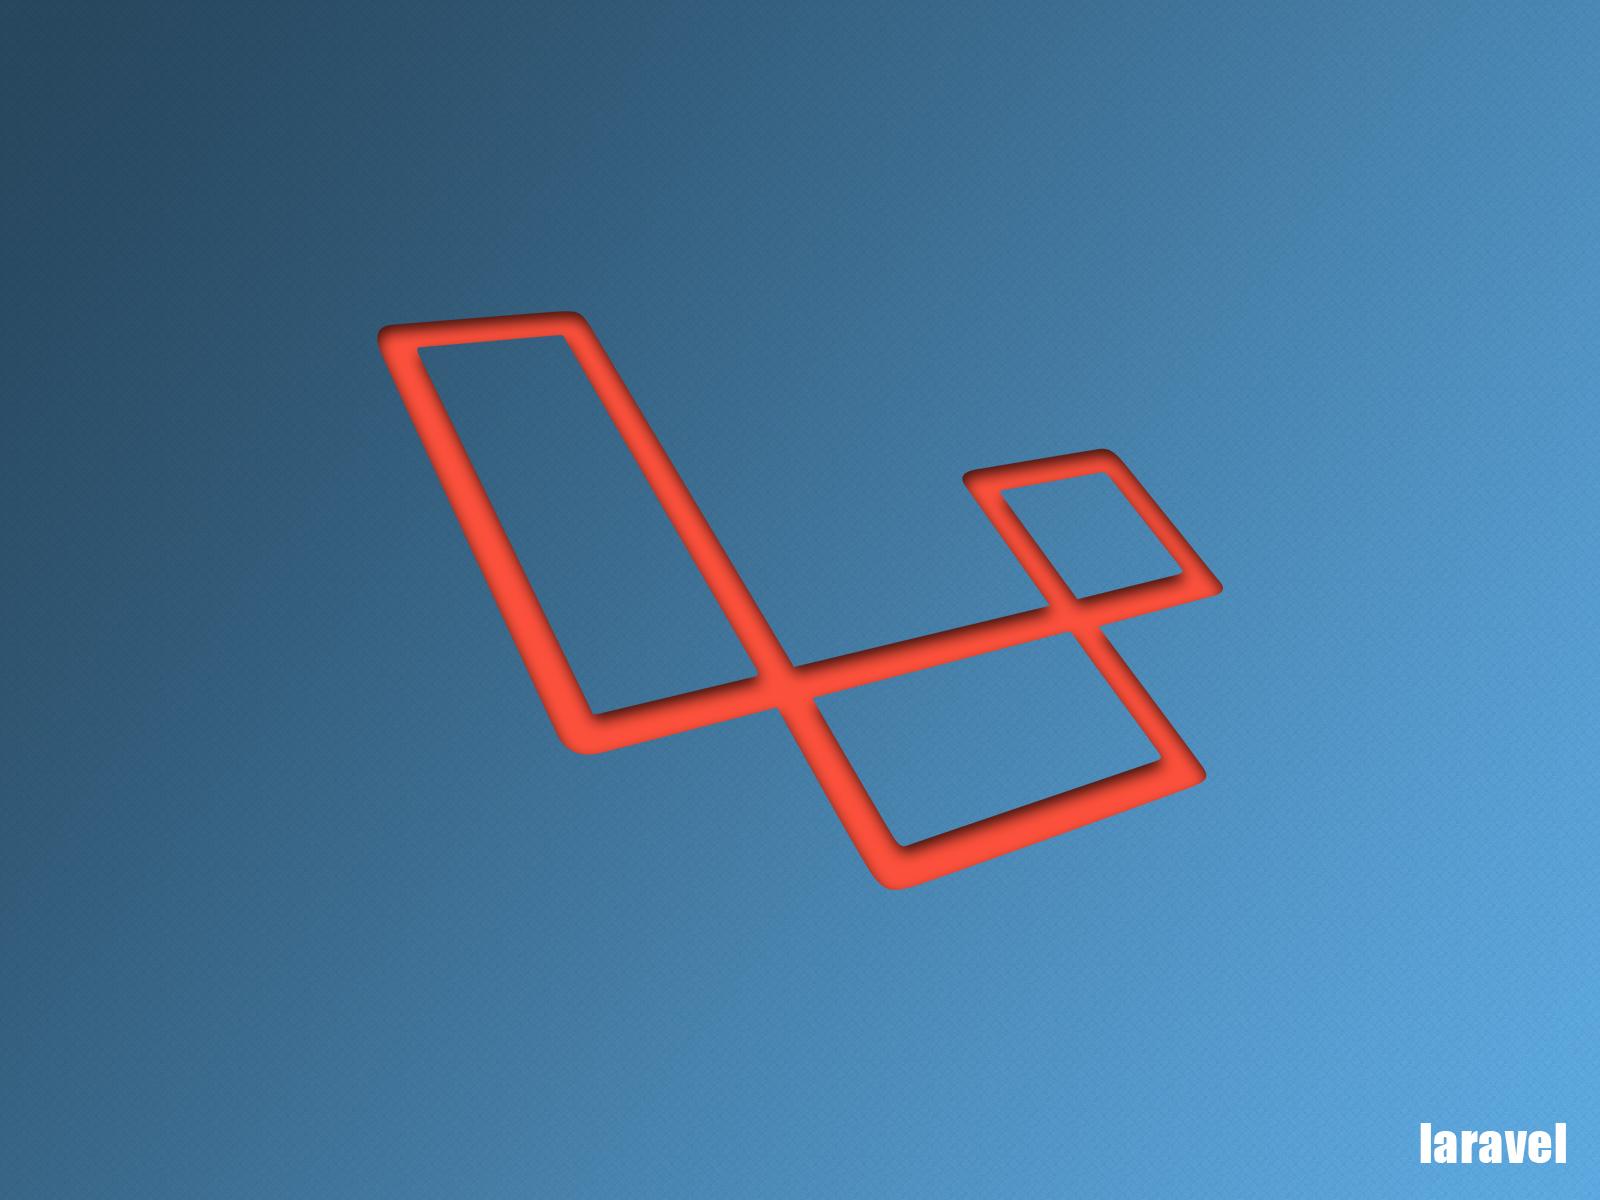 Laravel Wallpapers  Maks Surguys blog on Technology Innovation IoT Design and Code